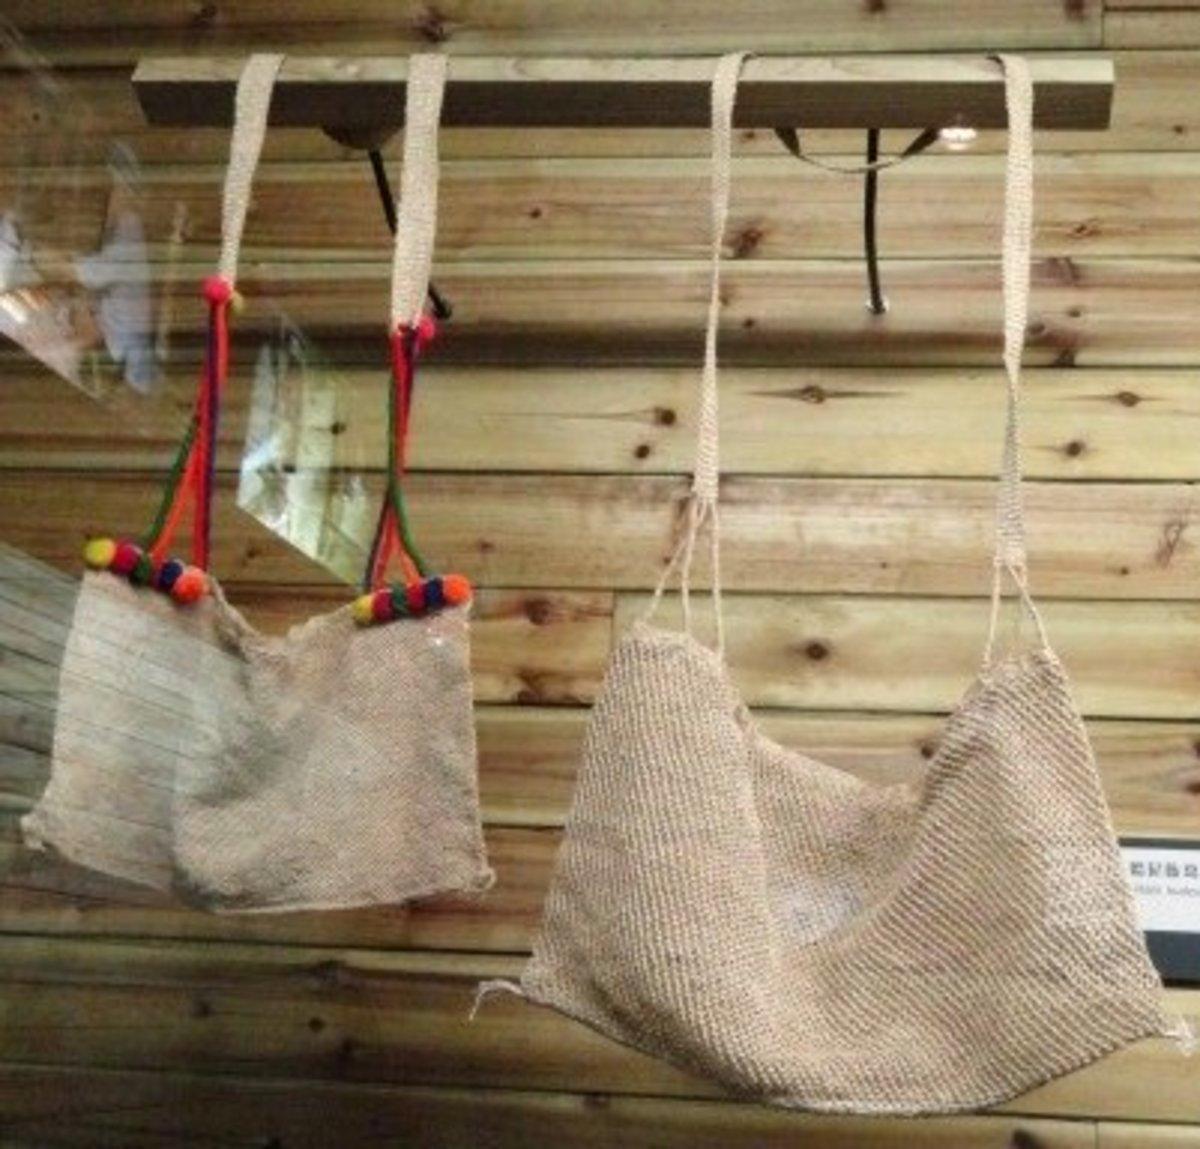 Tote bags made from woven kudzu fiber.